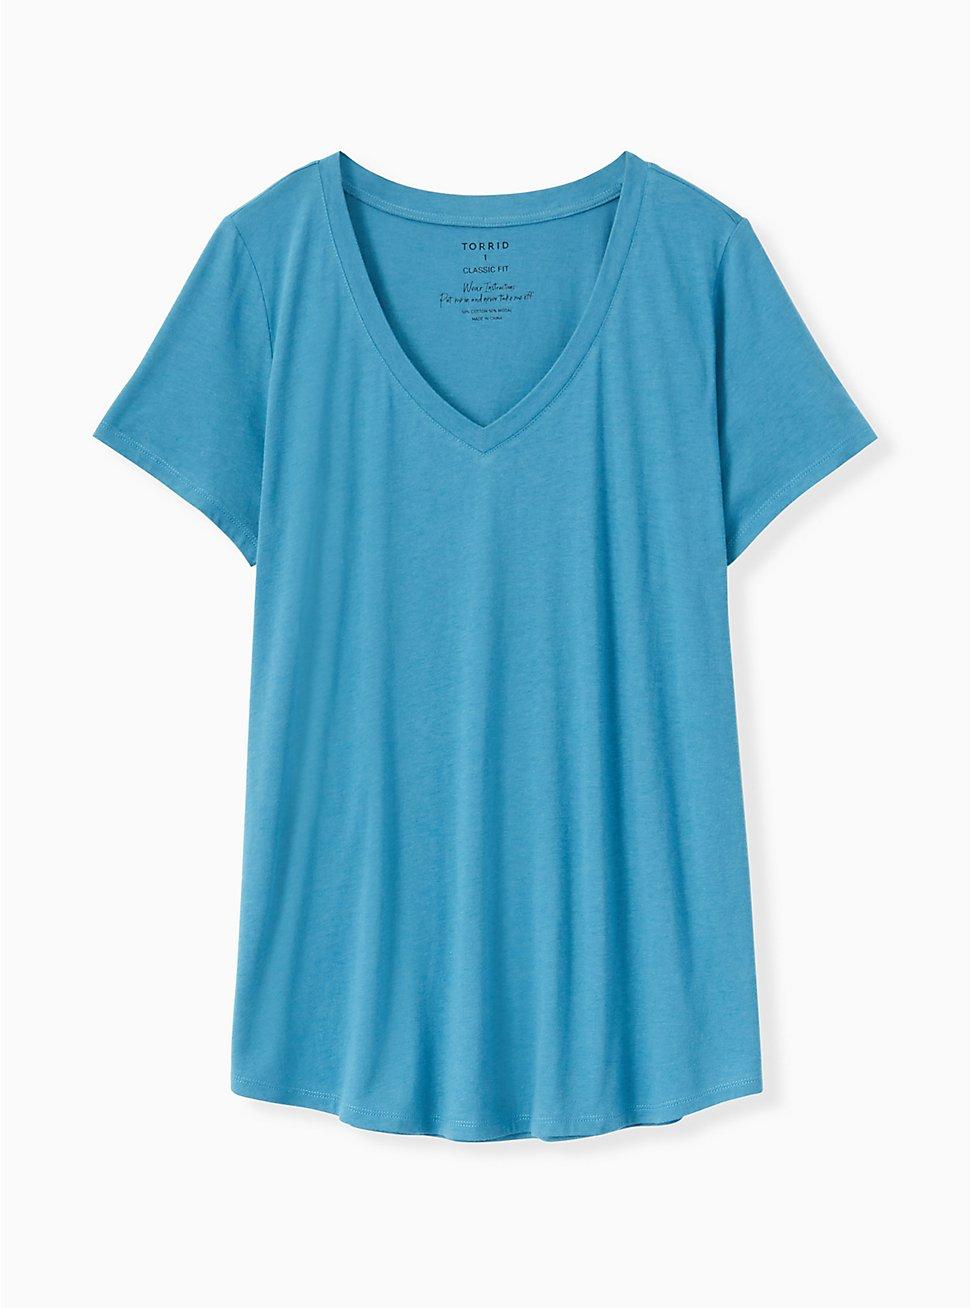 Plus Size Classic Fit V-Neck Tee - Heritage Cotton Blue, FAIENCE, hi-res